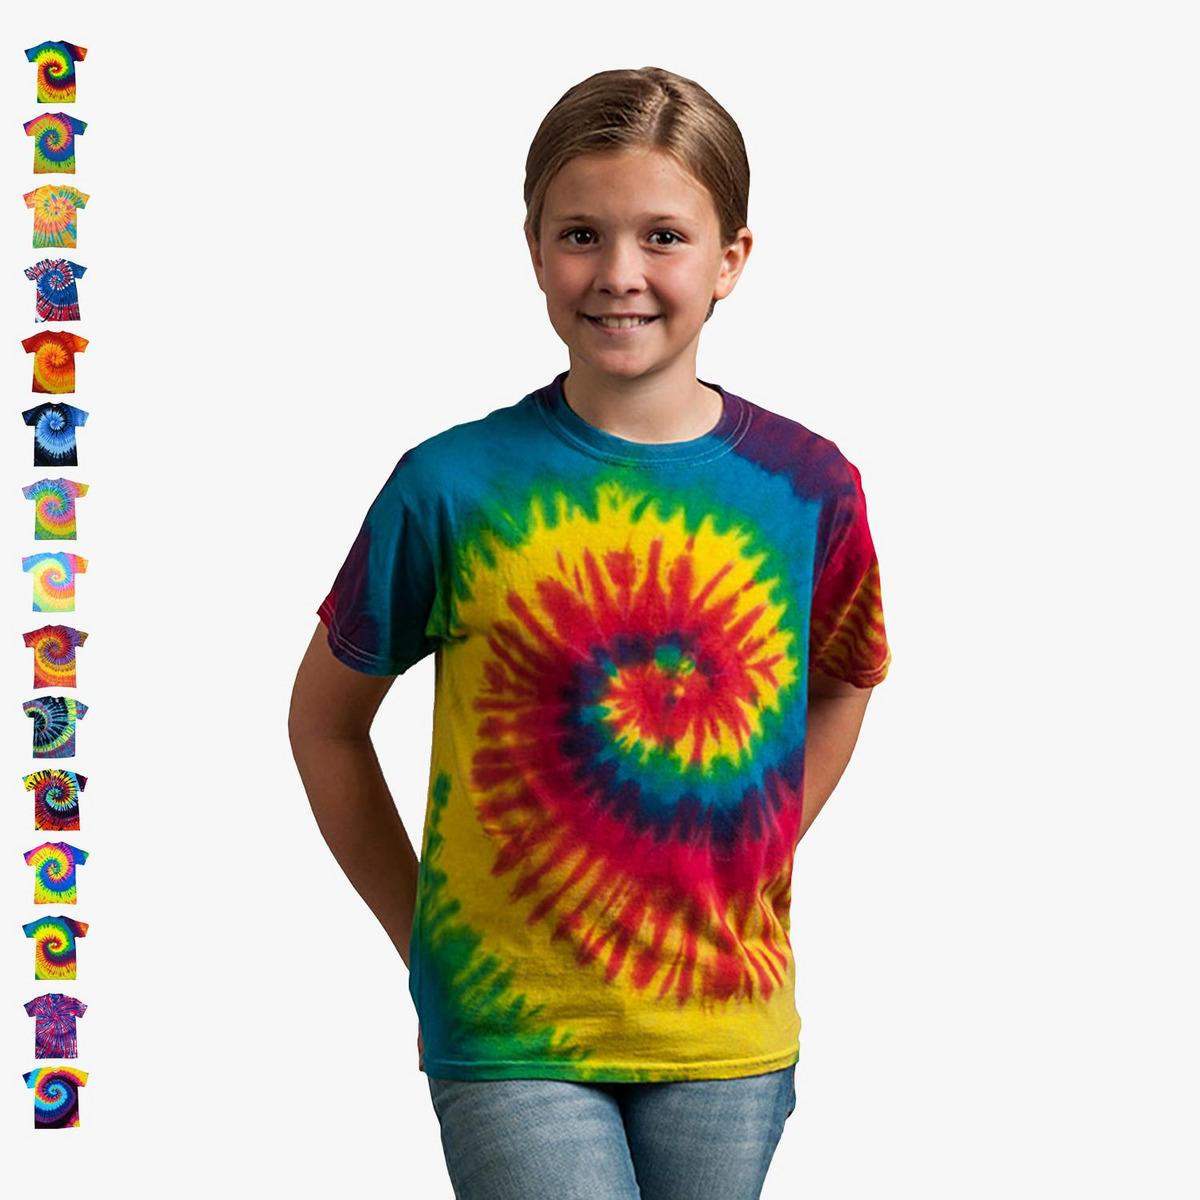 Colortone-bambini Batik T-shirt 'swirl'   Flower-power Hippie-